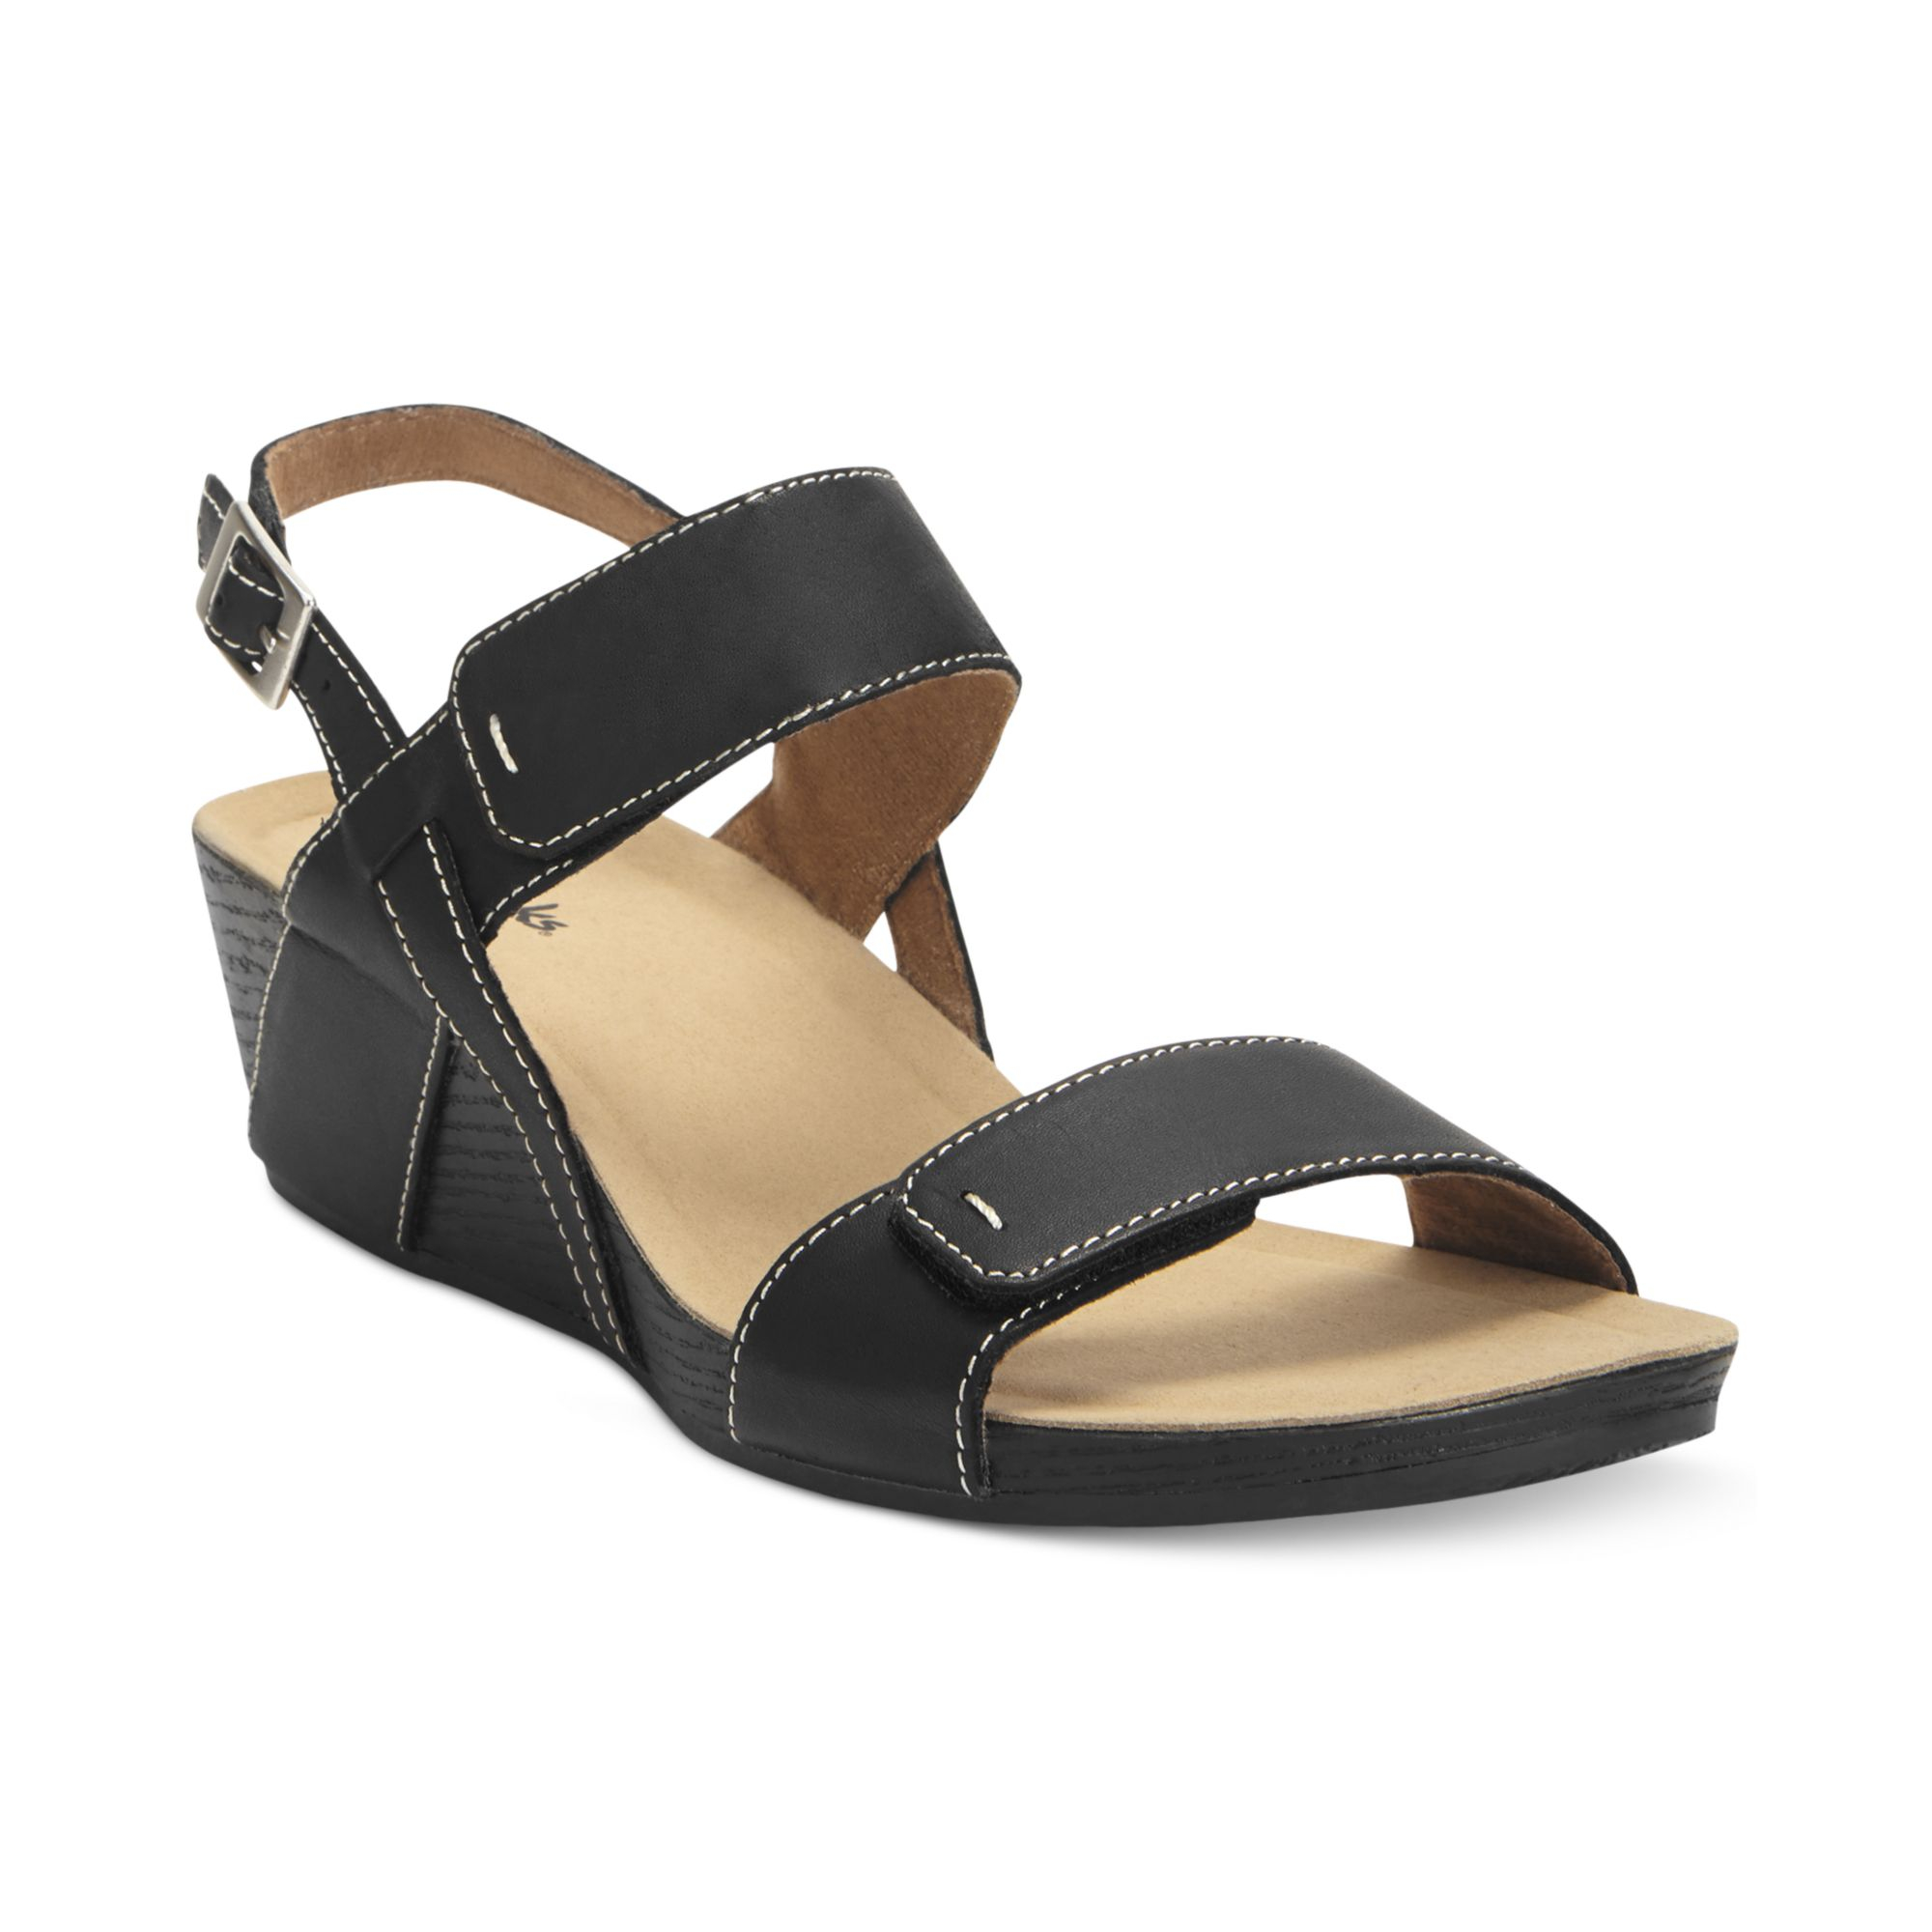 ee02dd095d9d Lyst - Clarks Alto Disco Platform Wedge Sandals in Black